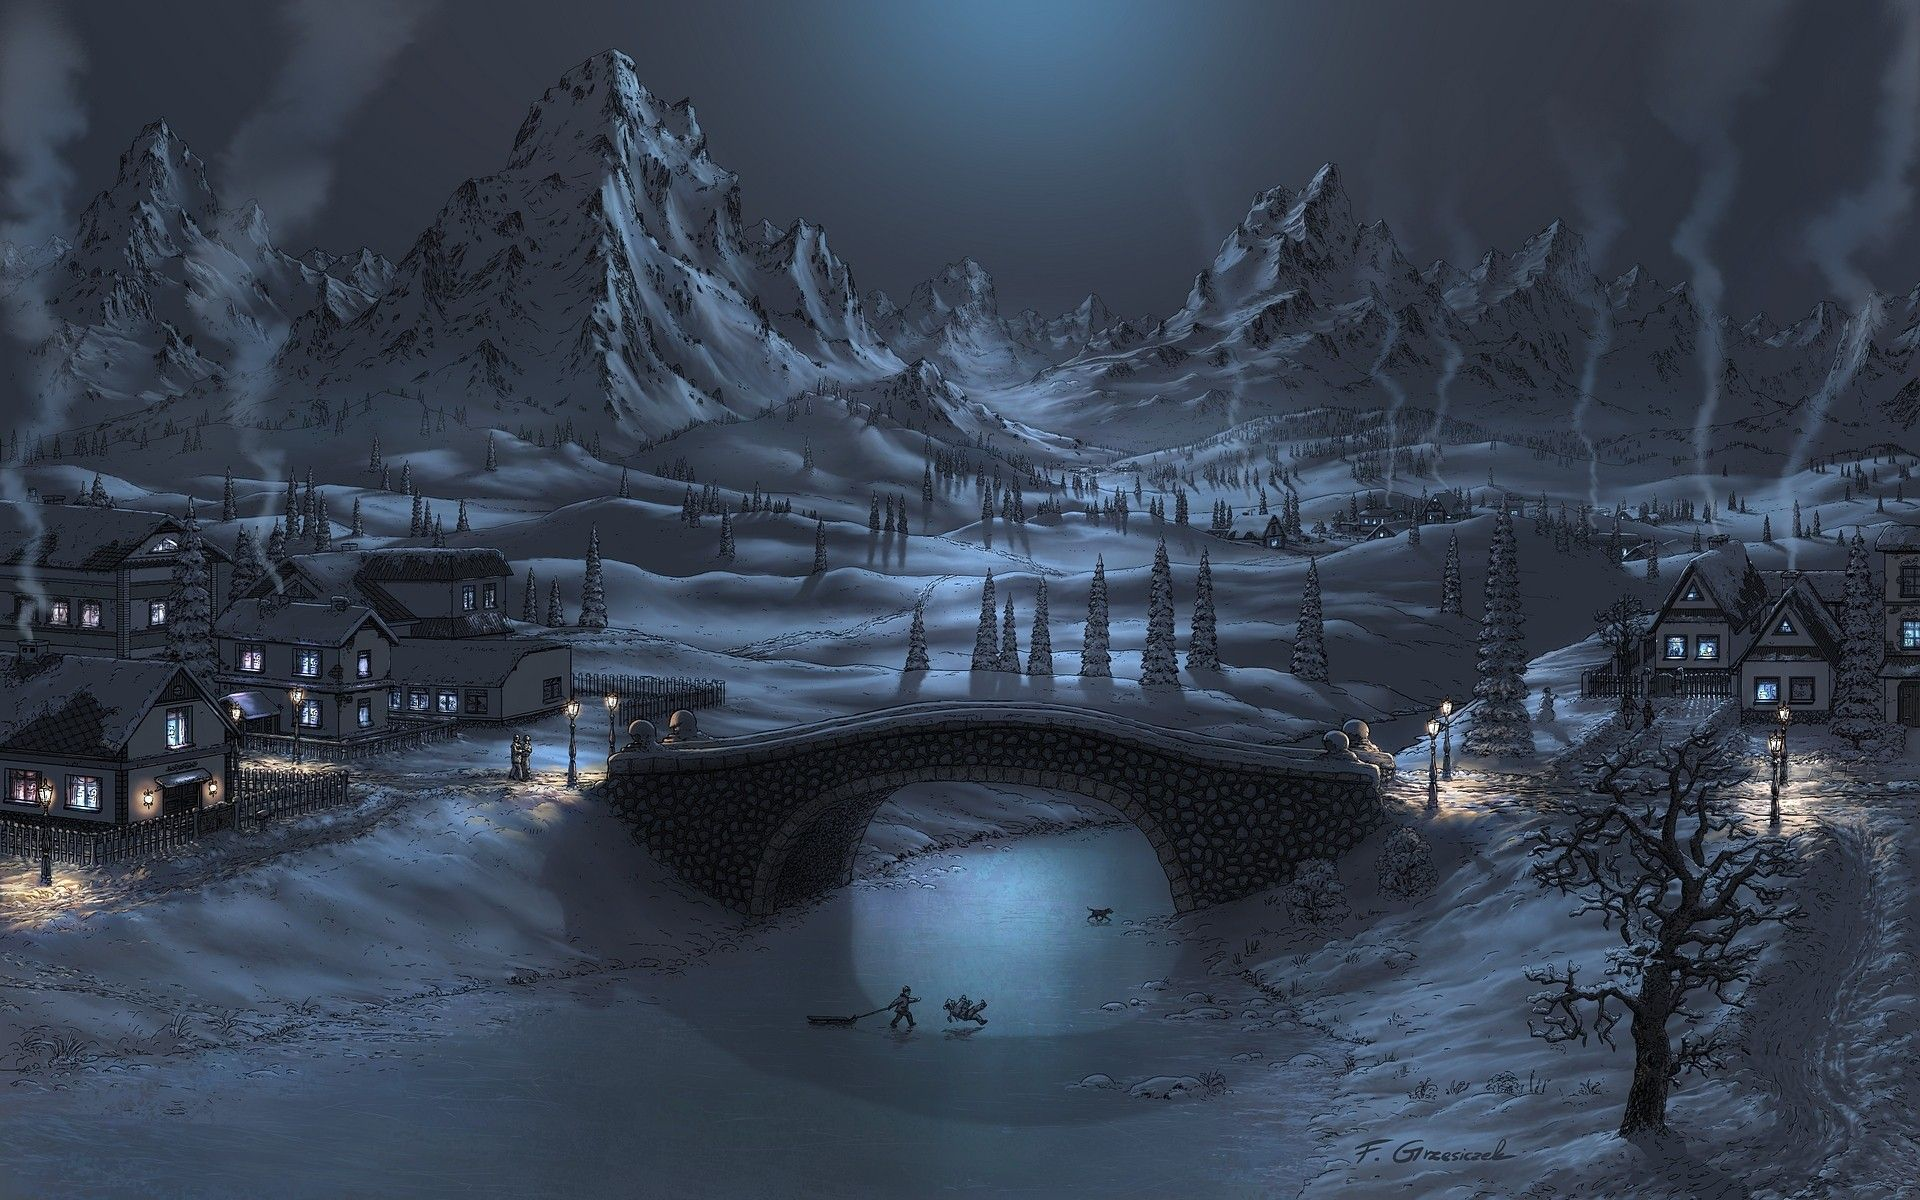 Mountains Winter Snow Night Bridges Artwork Fel X Wallpaper Background Winter Wallpaper Hd Snow Night Winter Wallpaper